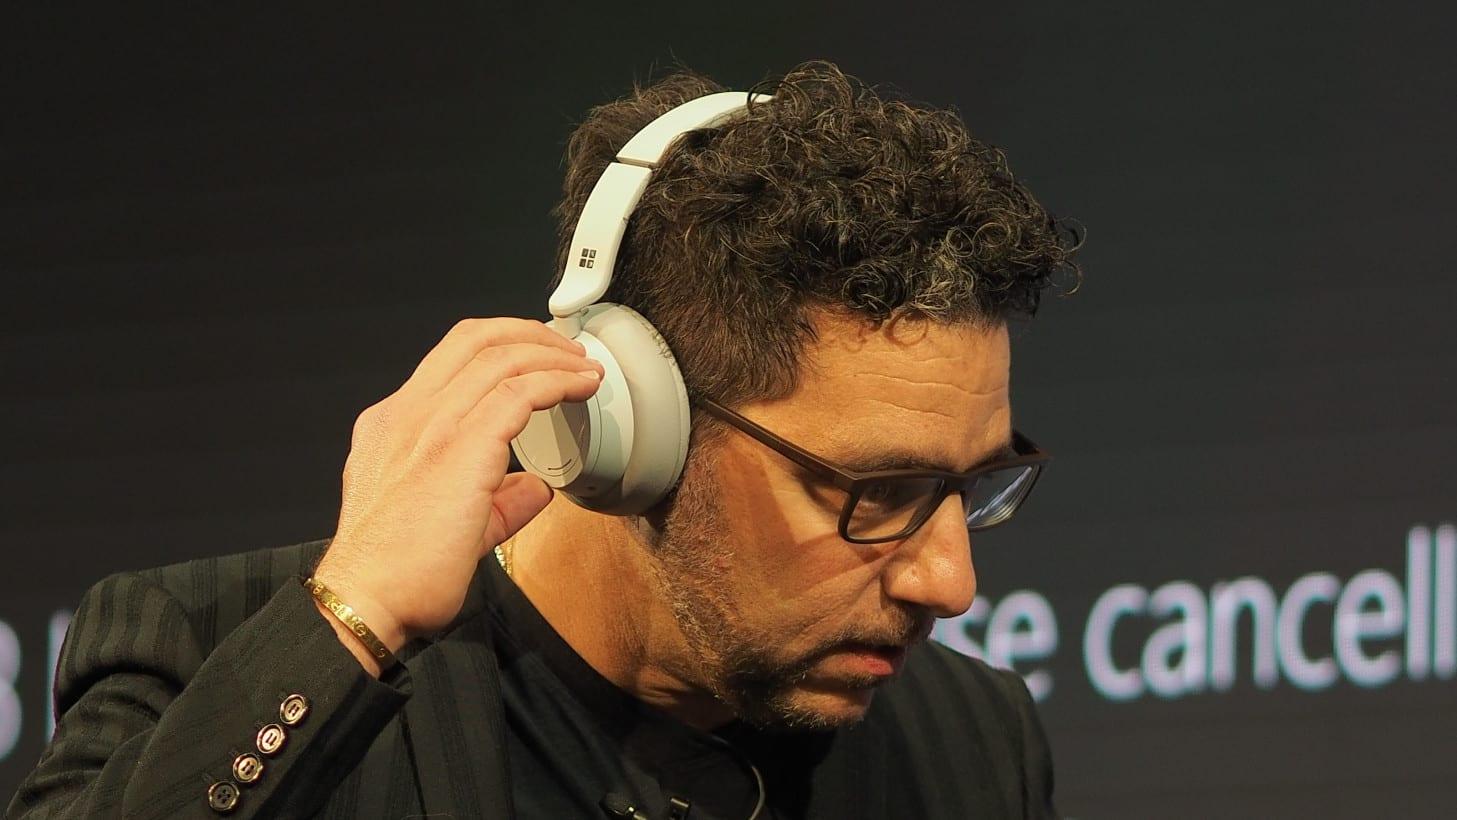 Surface-Headphones (1)